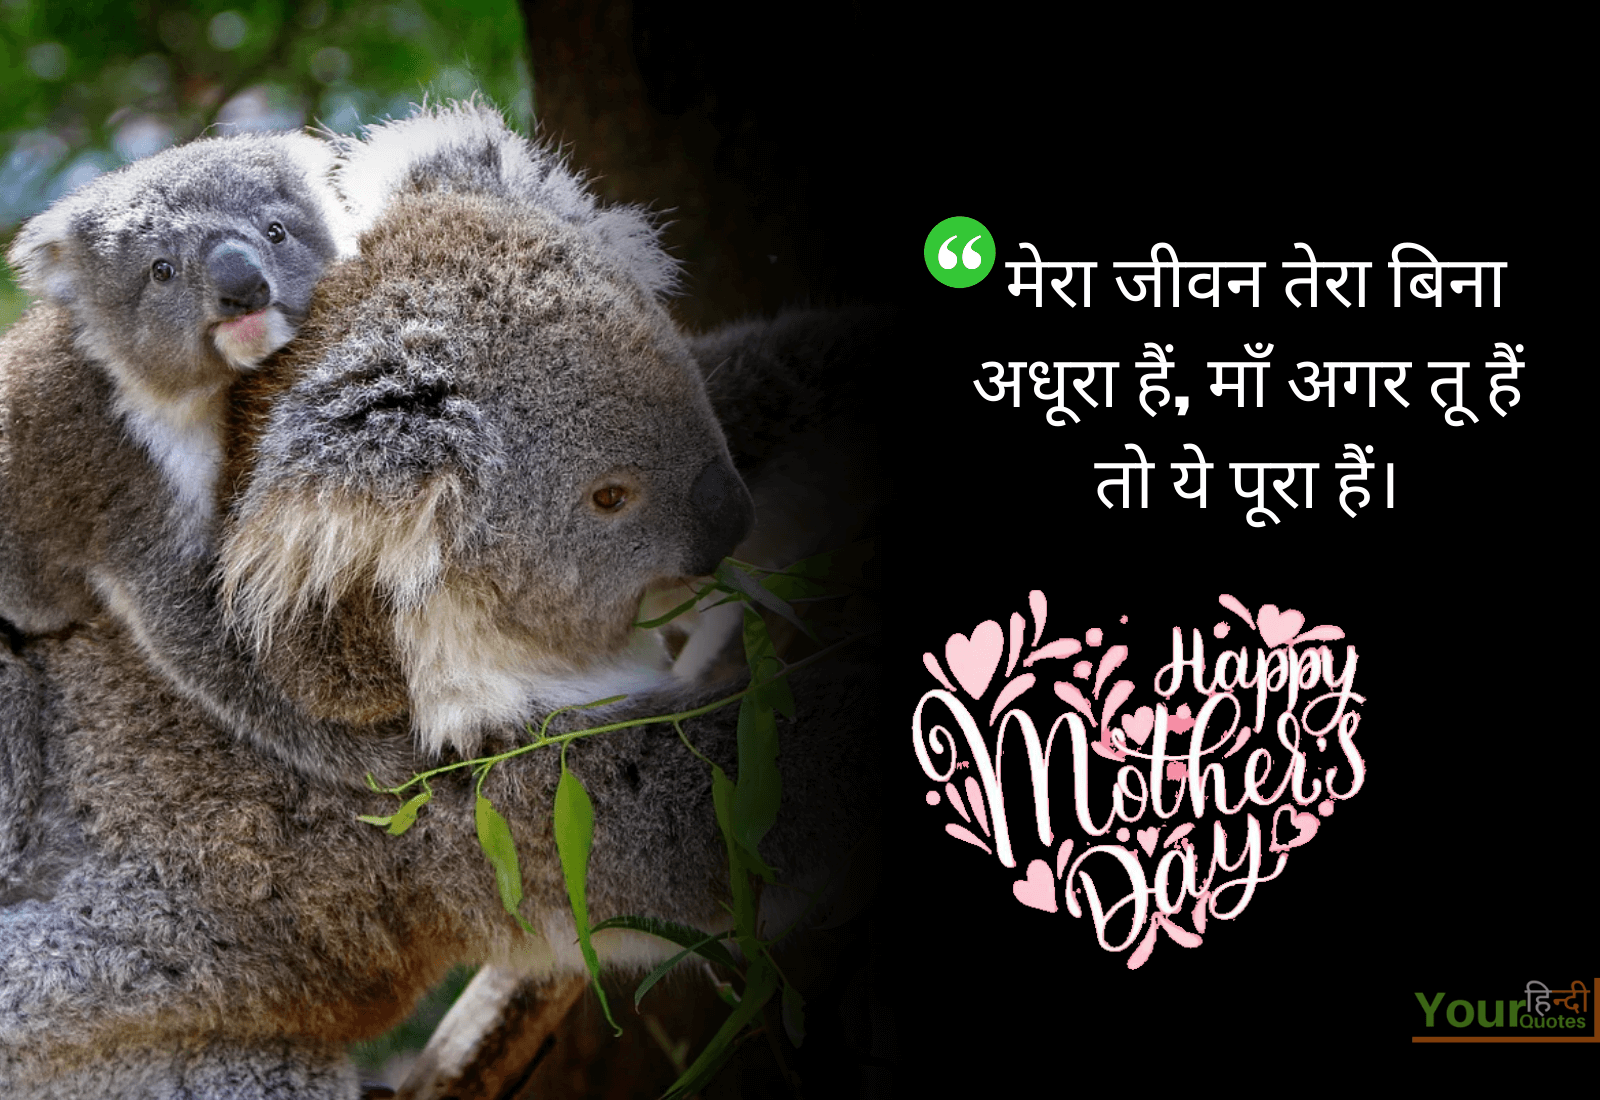 Happy Mothers Day Hindi Image